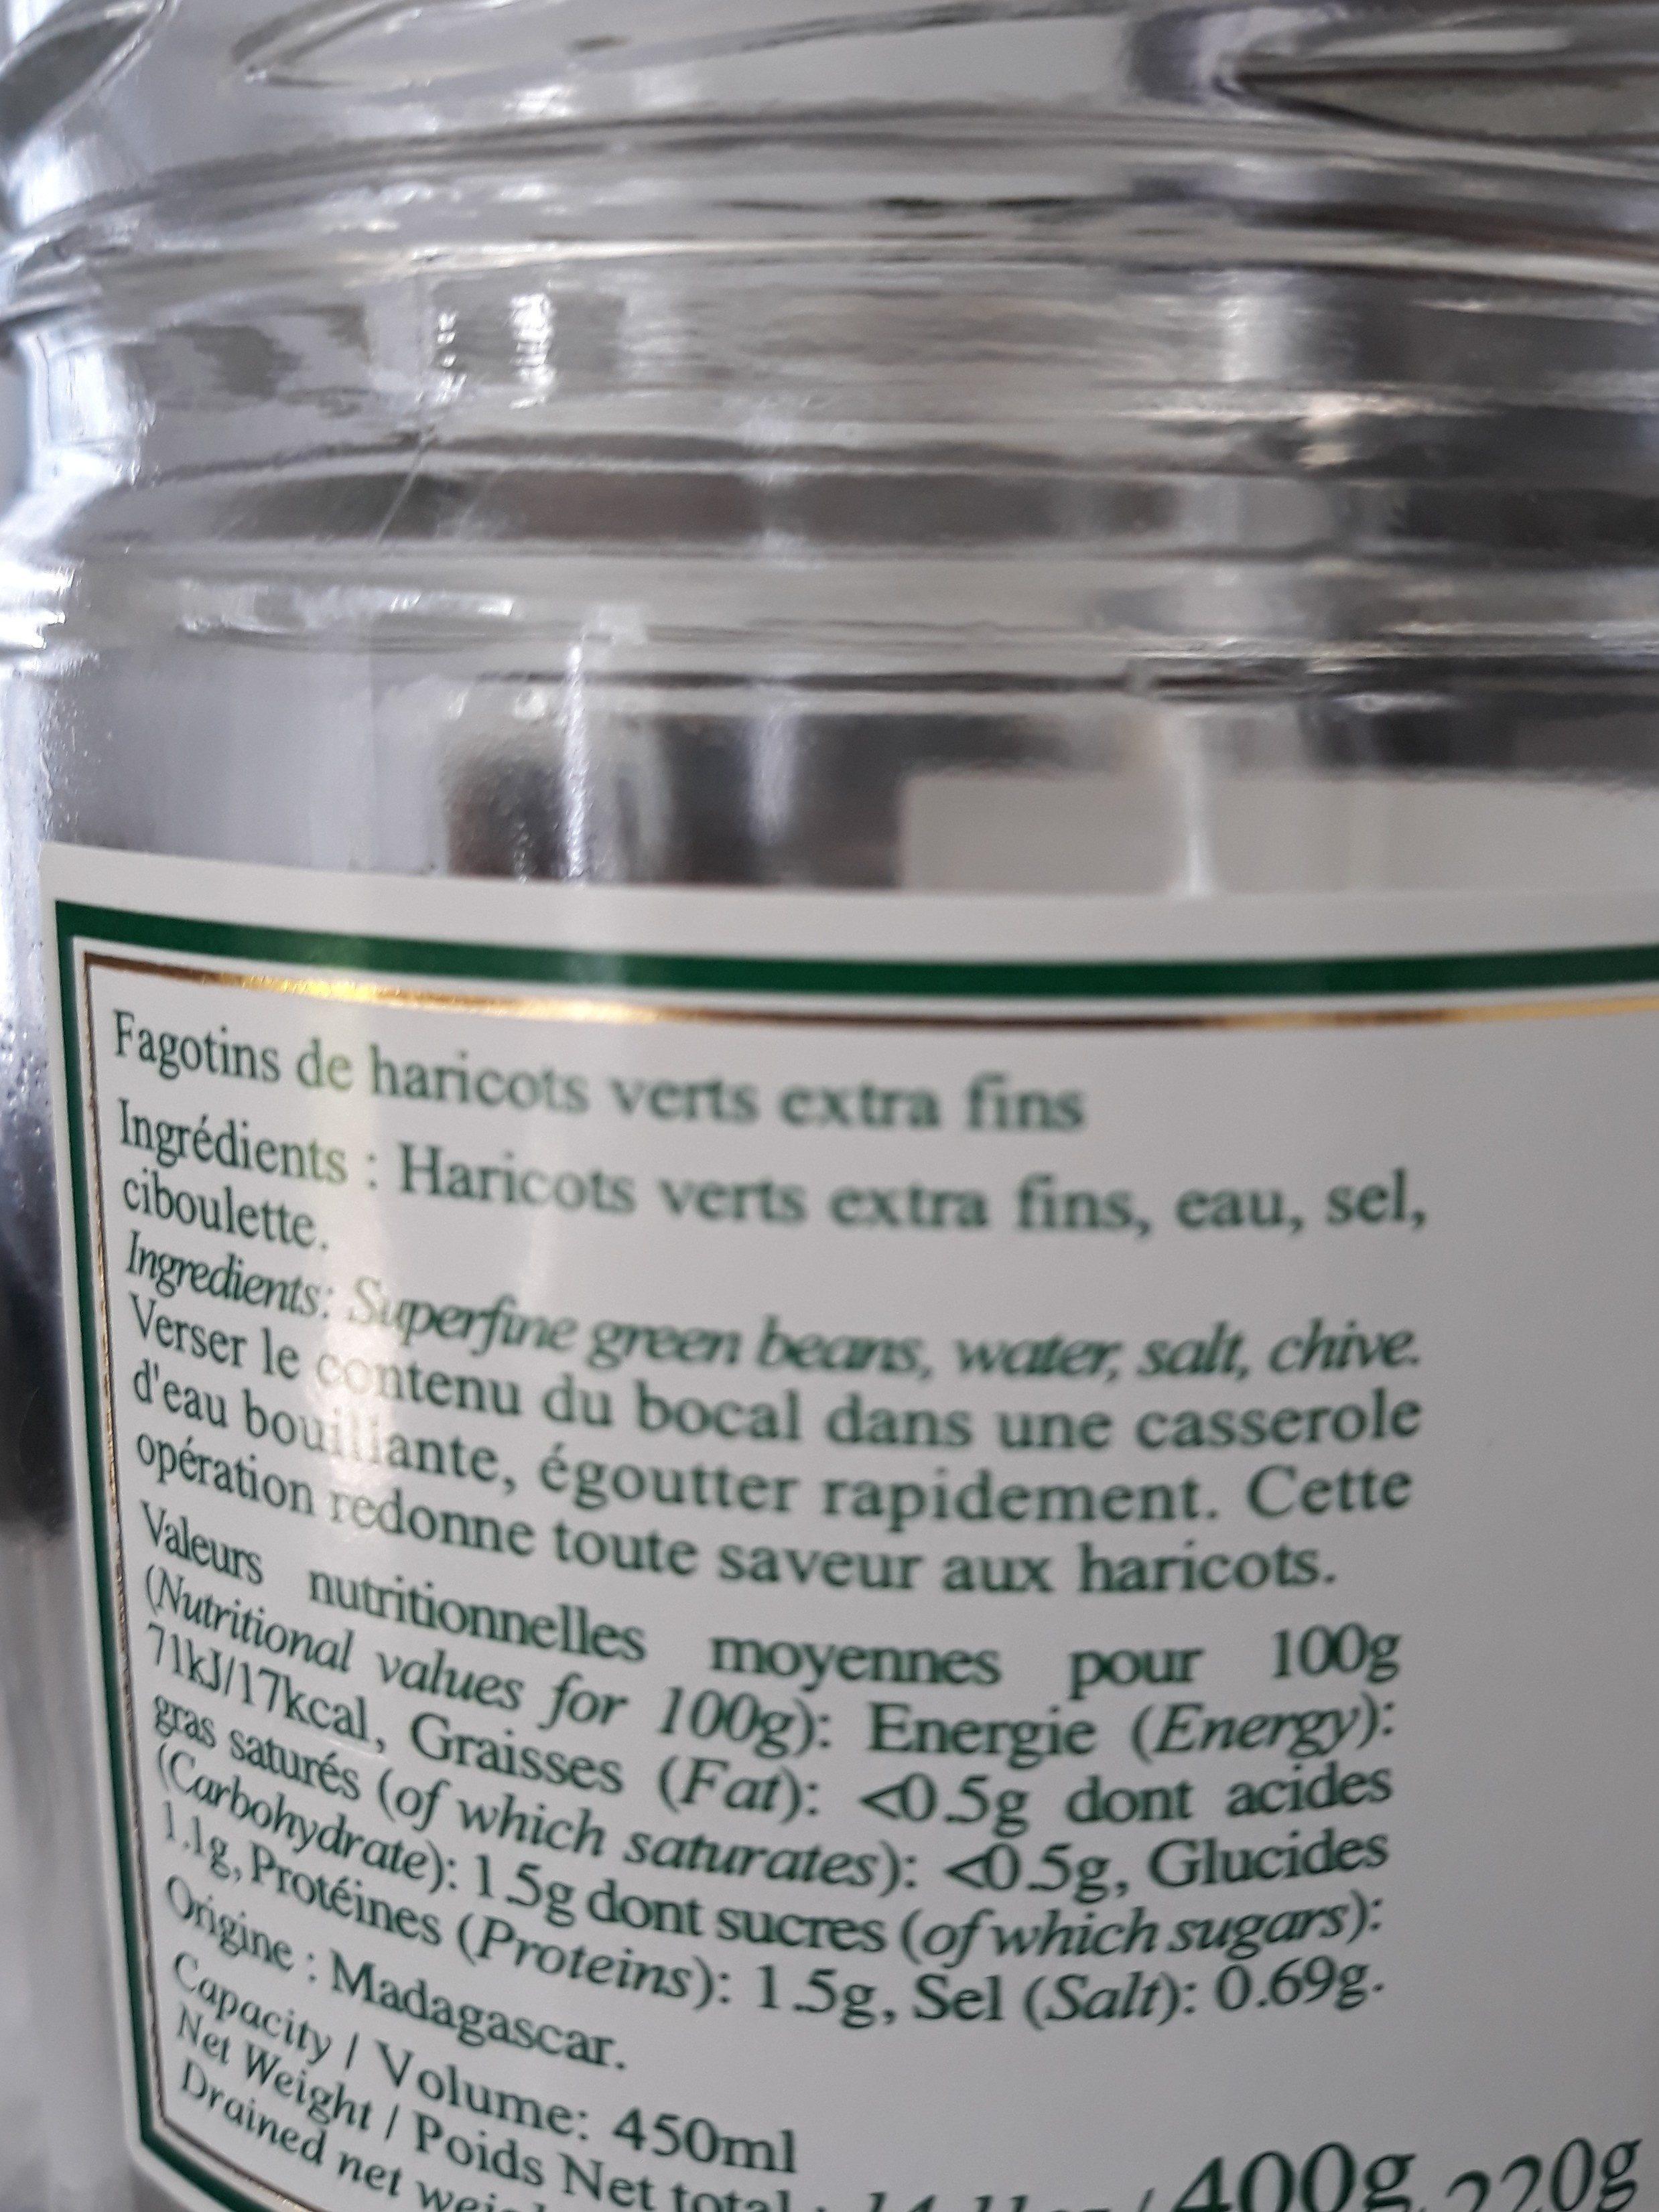 Haricots verts extra fins - Ingrédients - fr